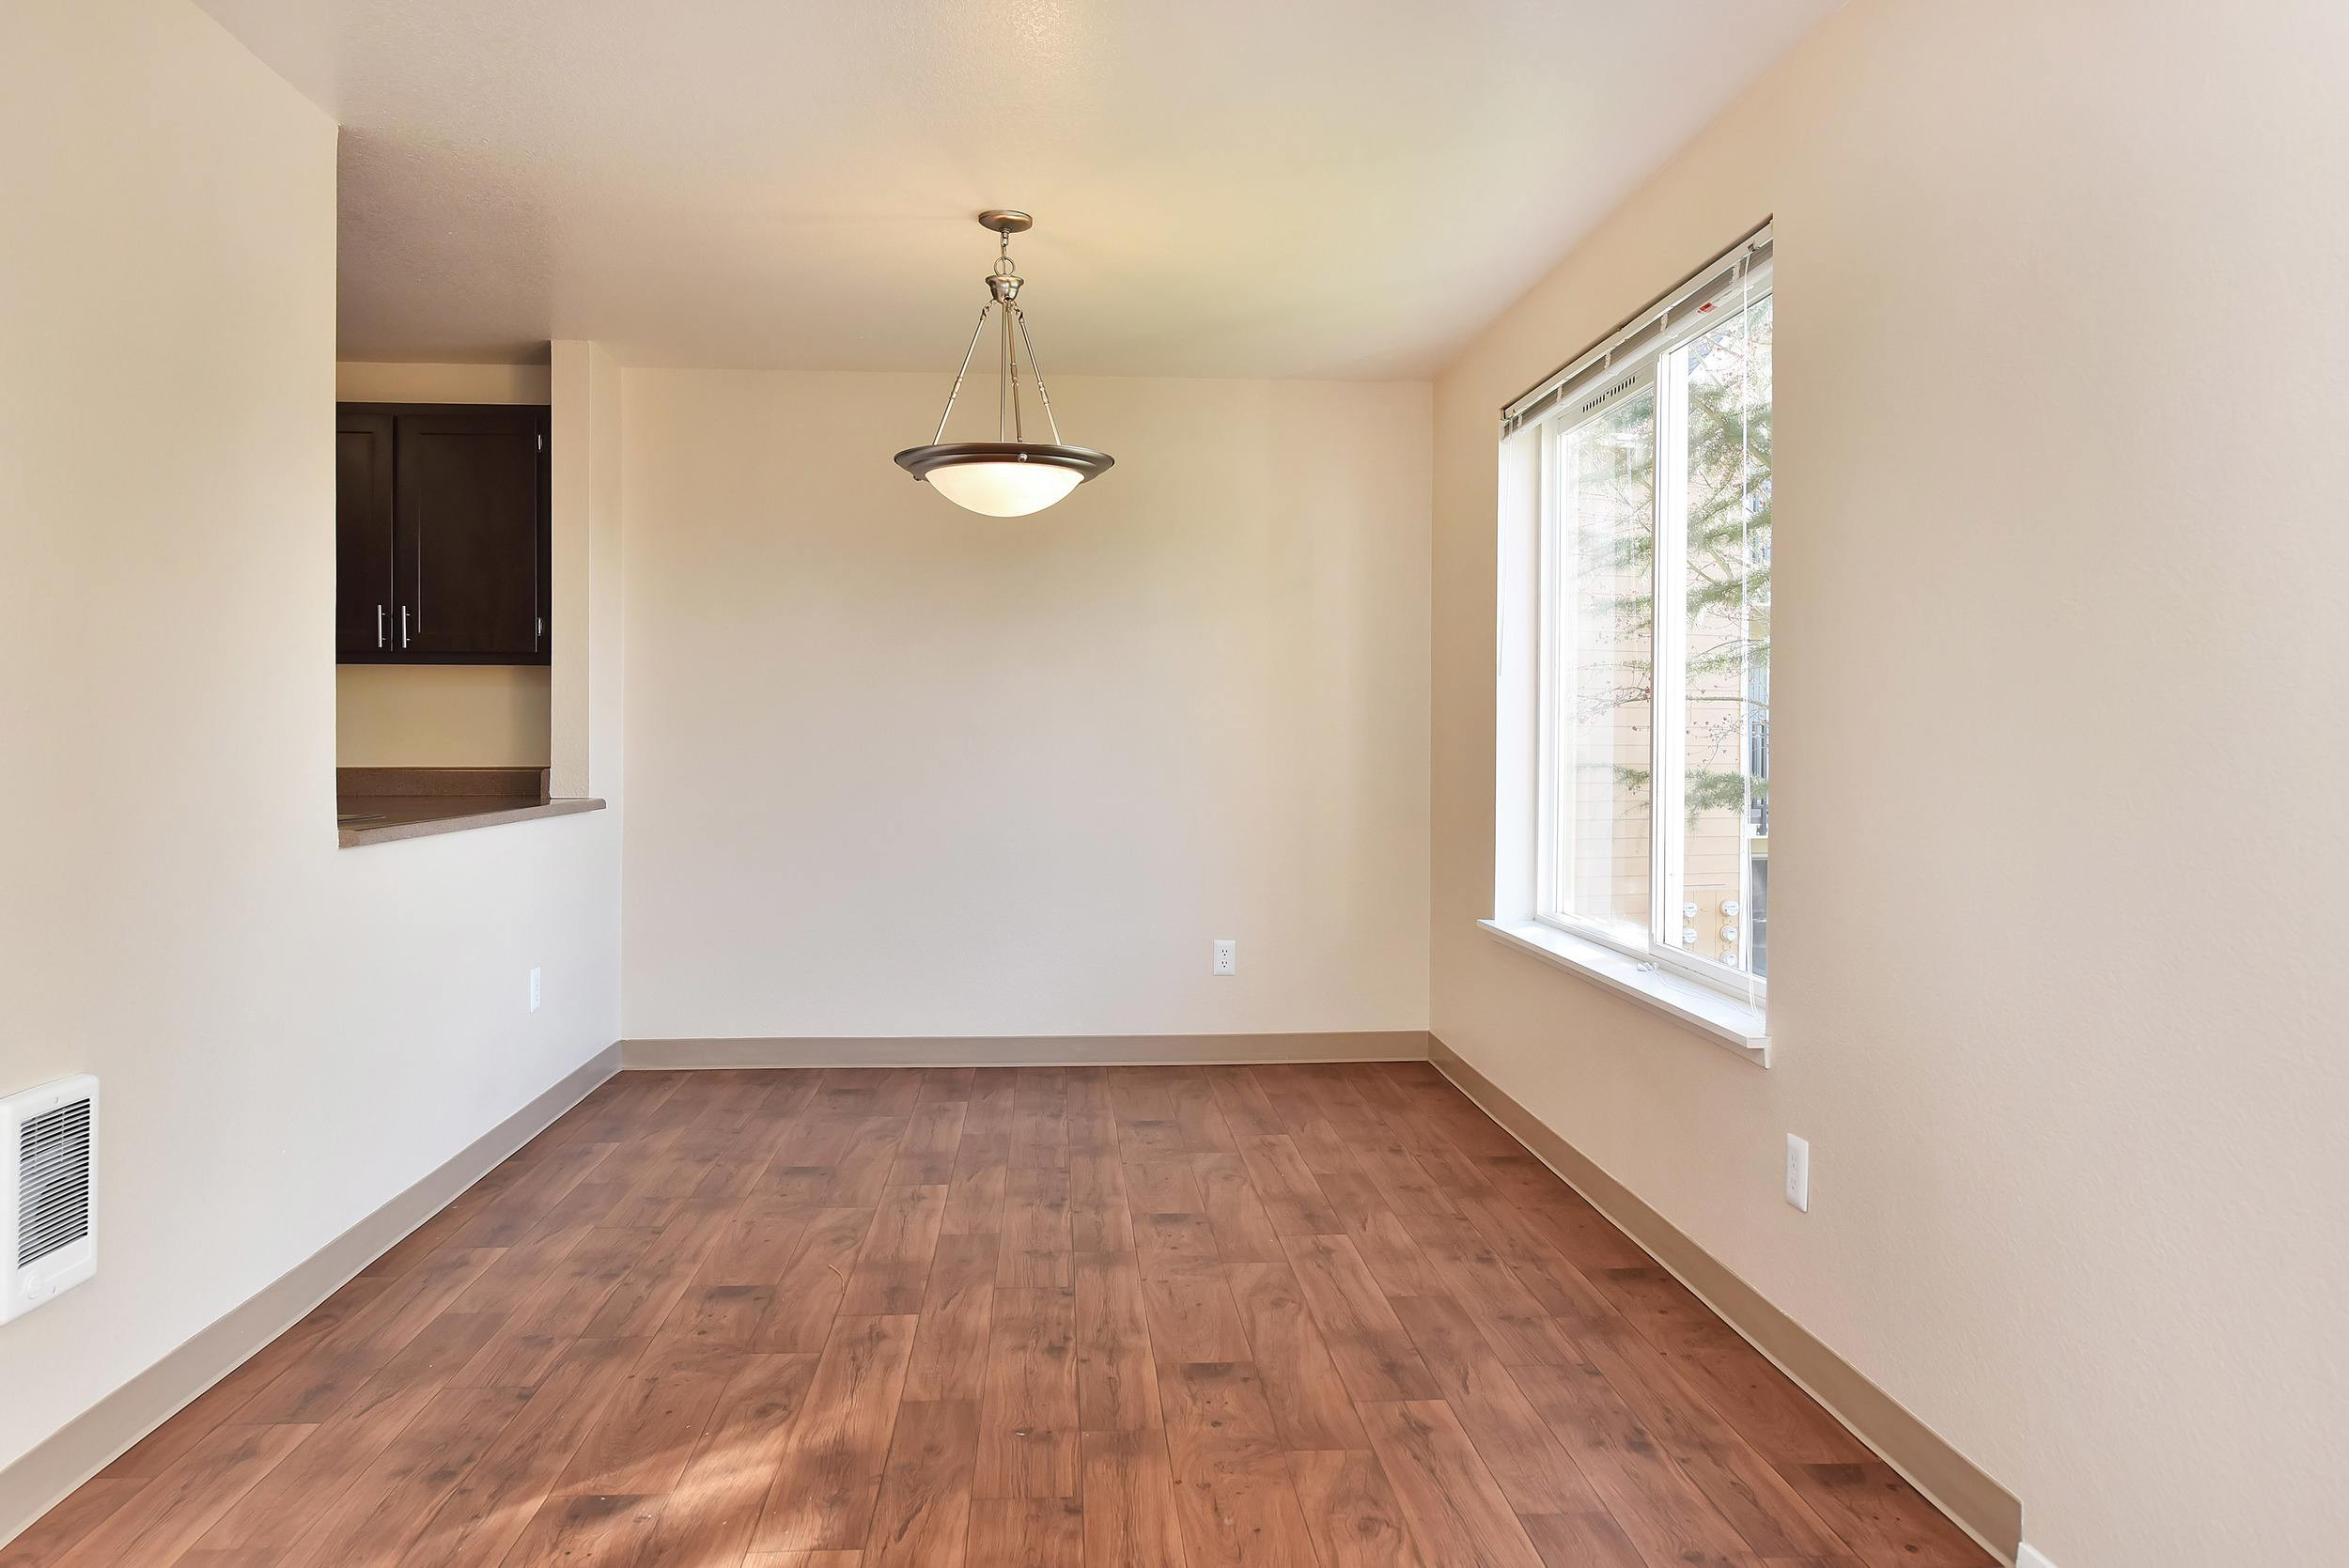 Spacious living room at apartments in Clackamas, Oregon